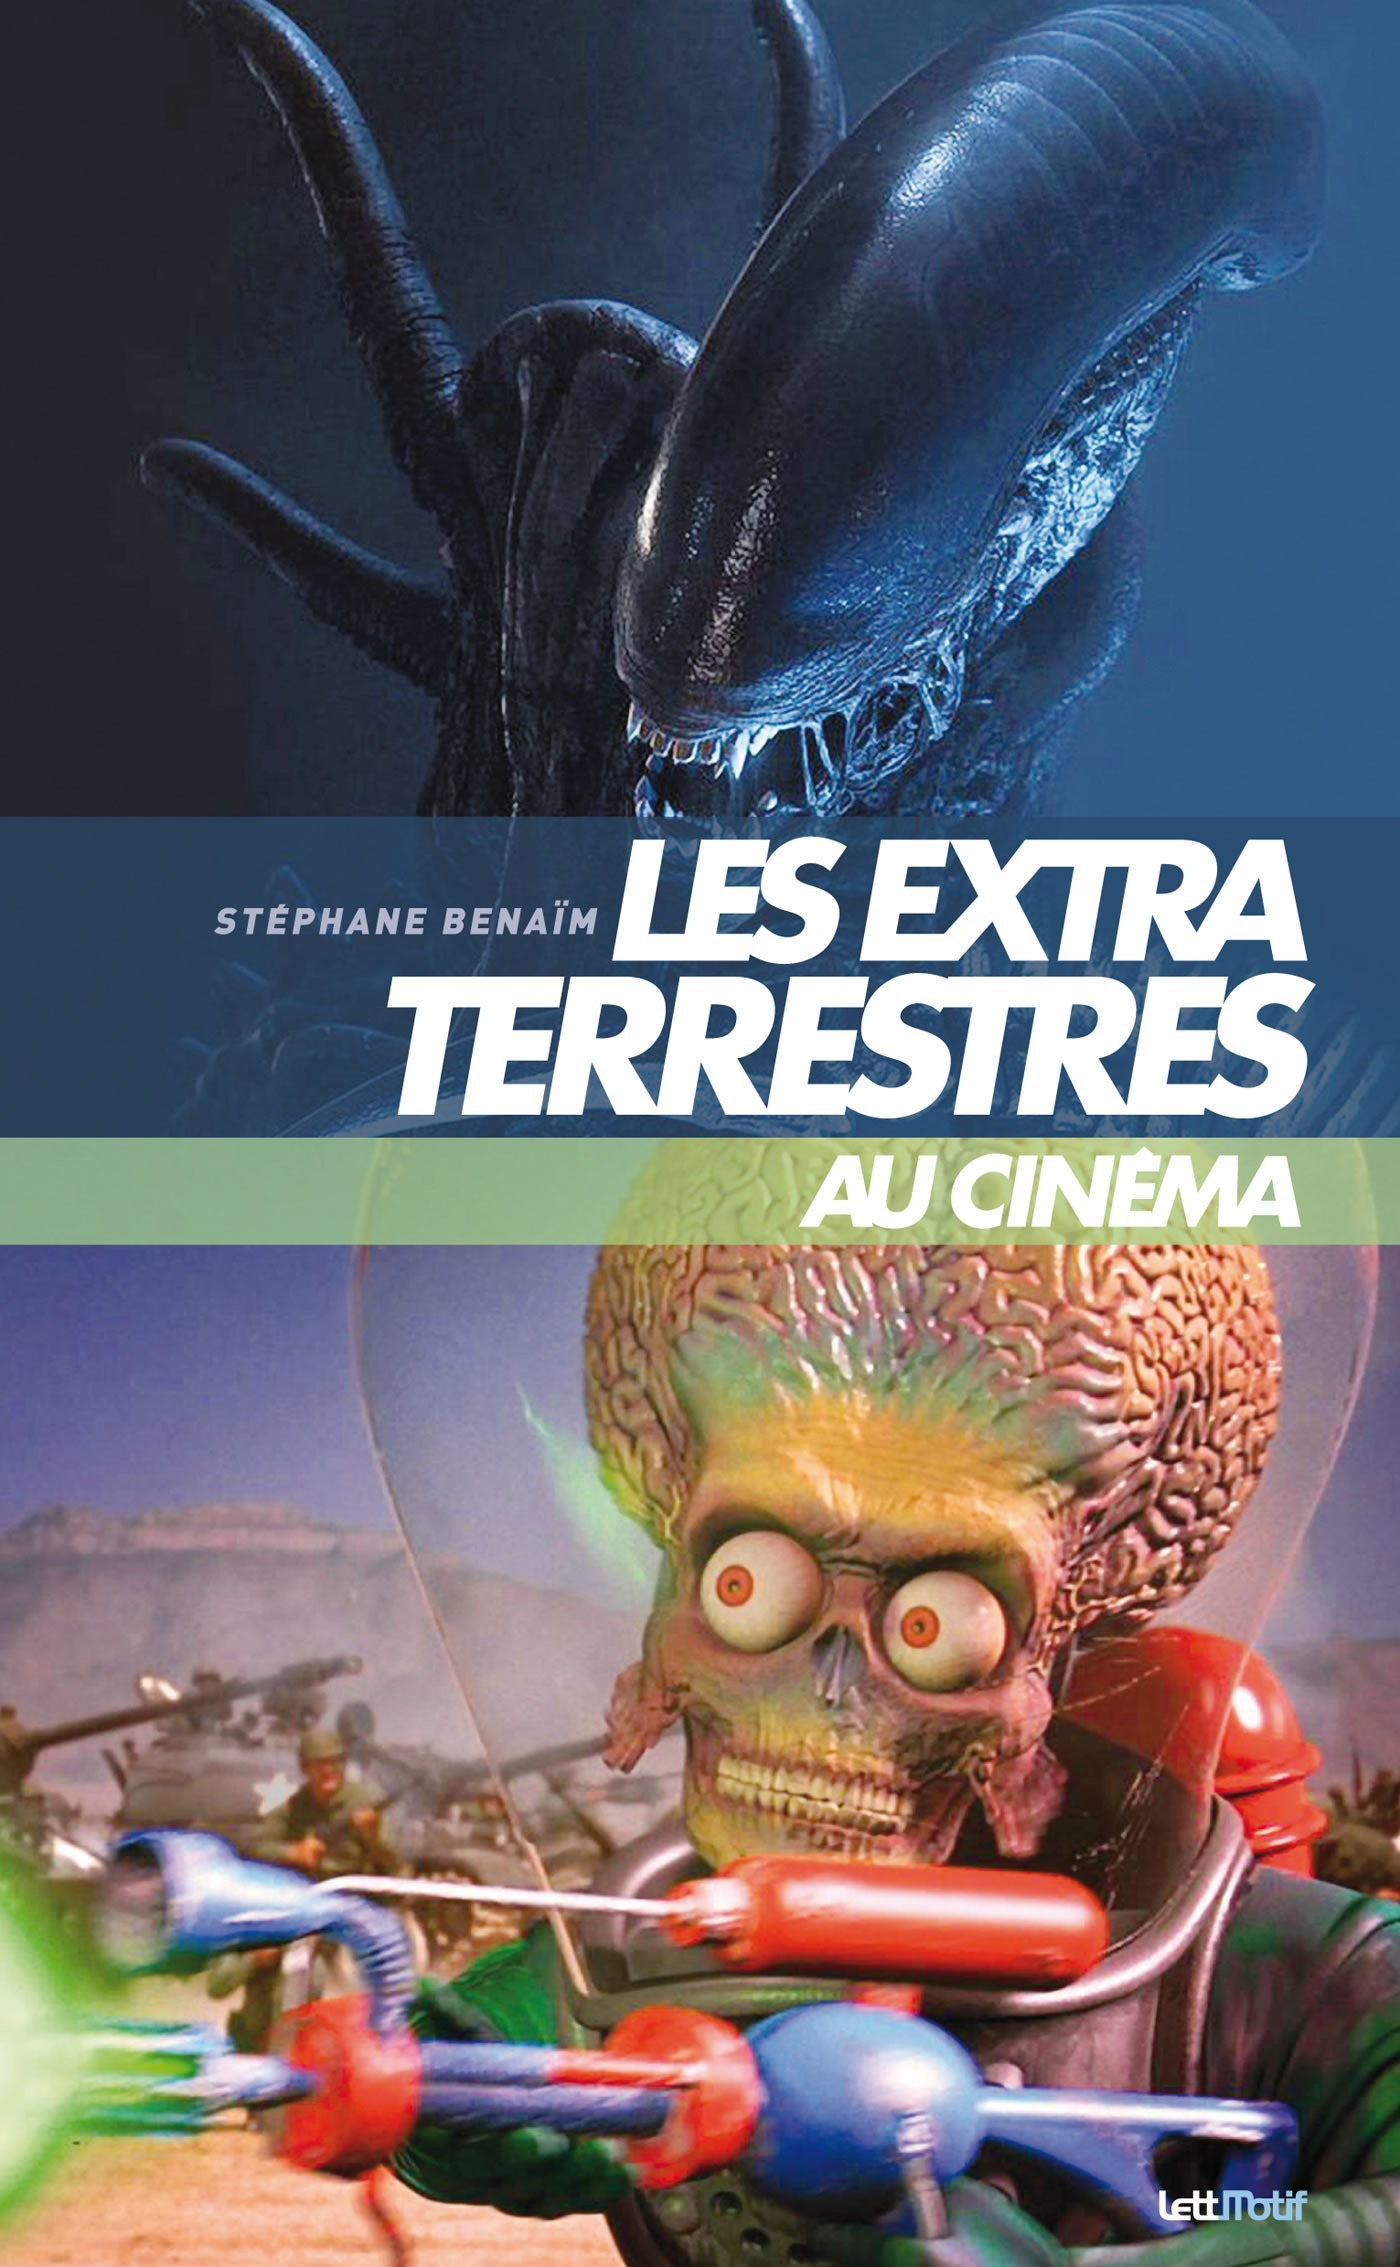 Les extraterrestres au cinéma